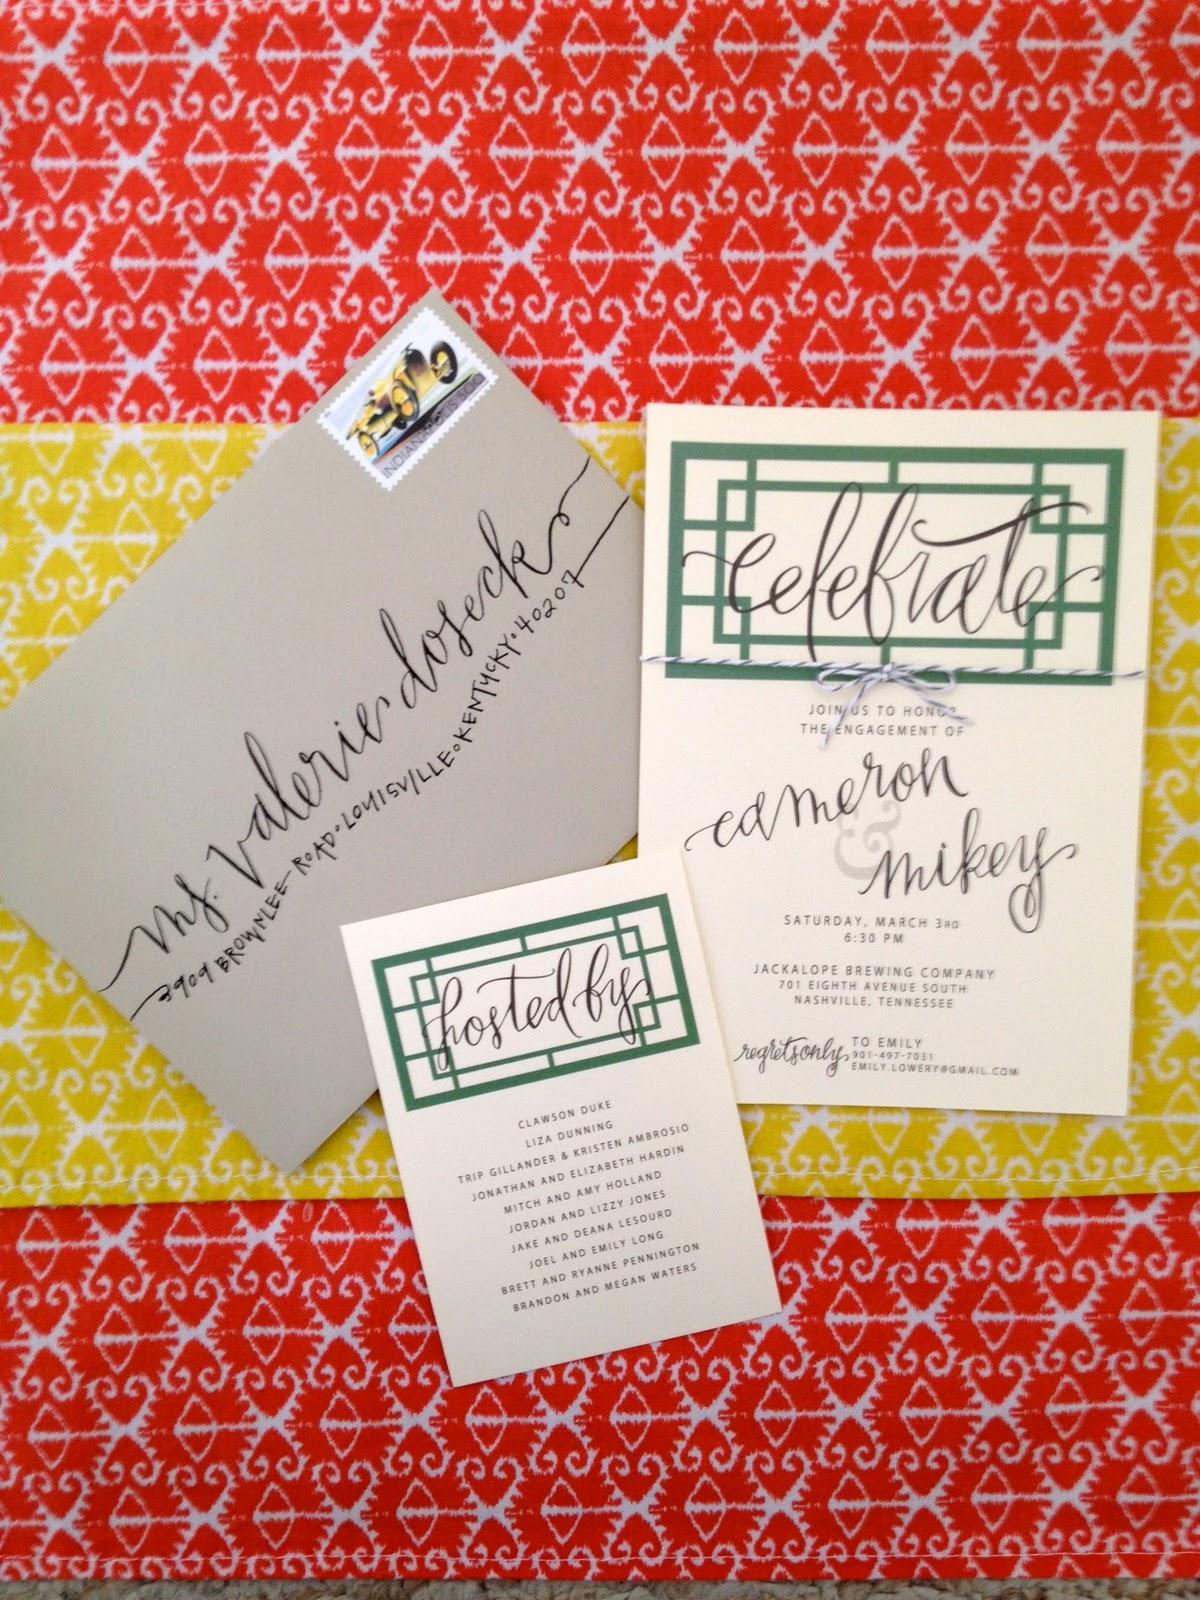 hardink calligraphy engagement party invitation. Black Bedroom Furniture Sets. Home Design Ideas